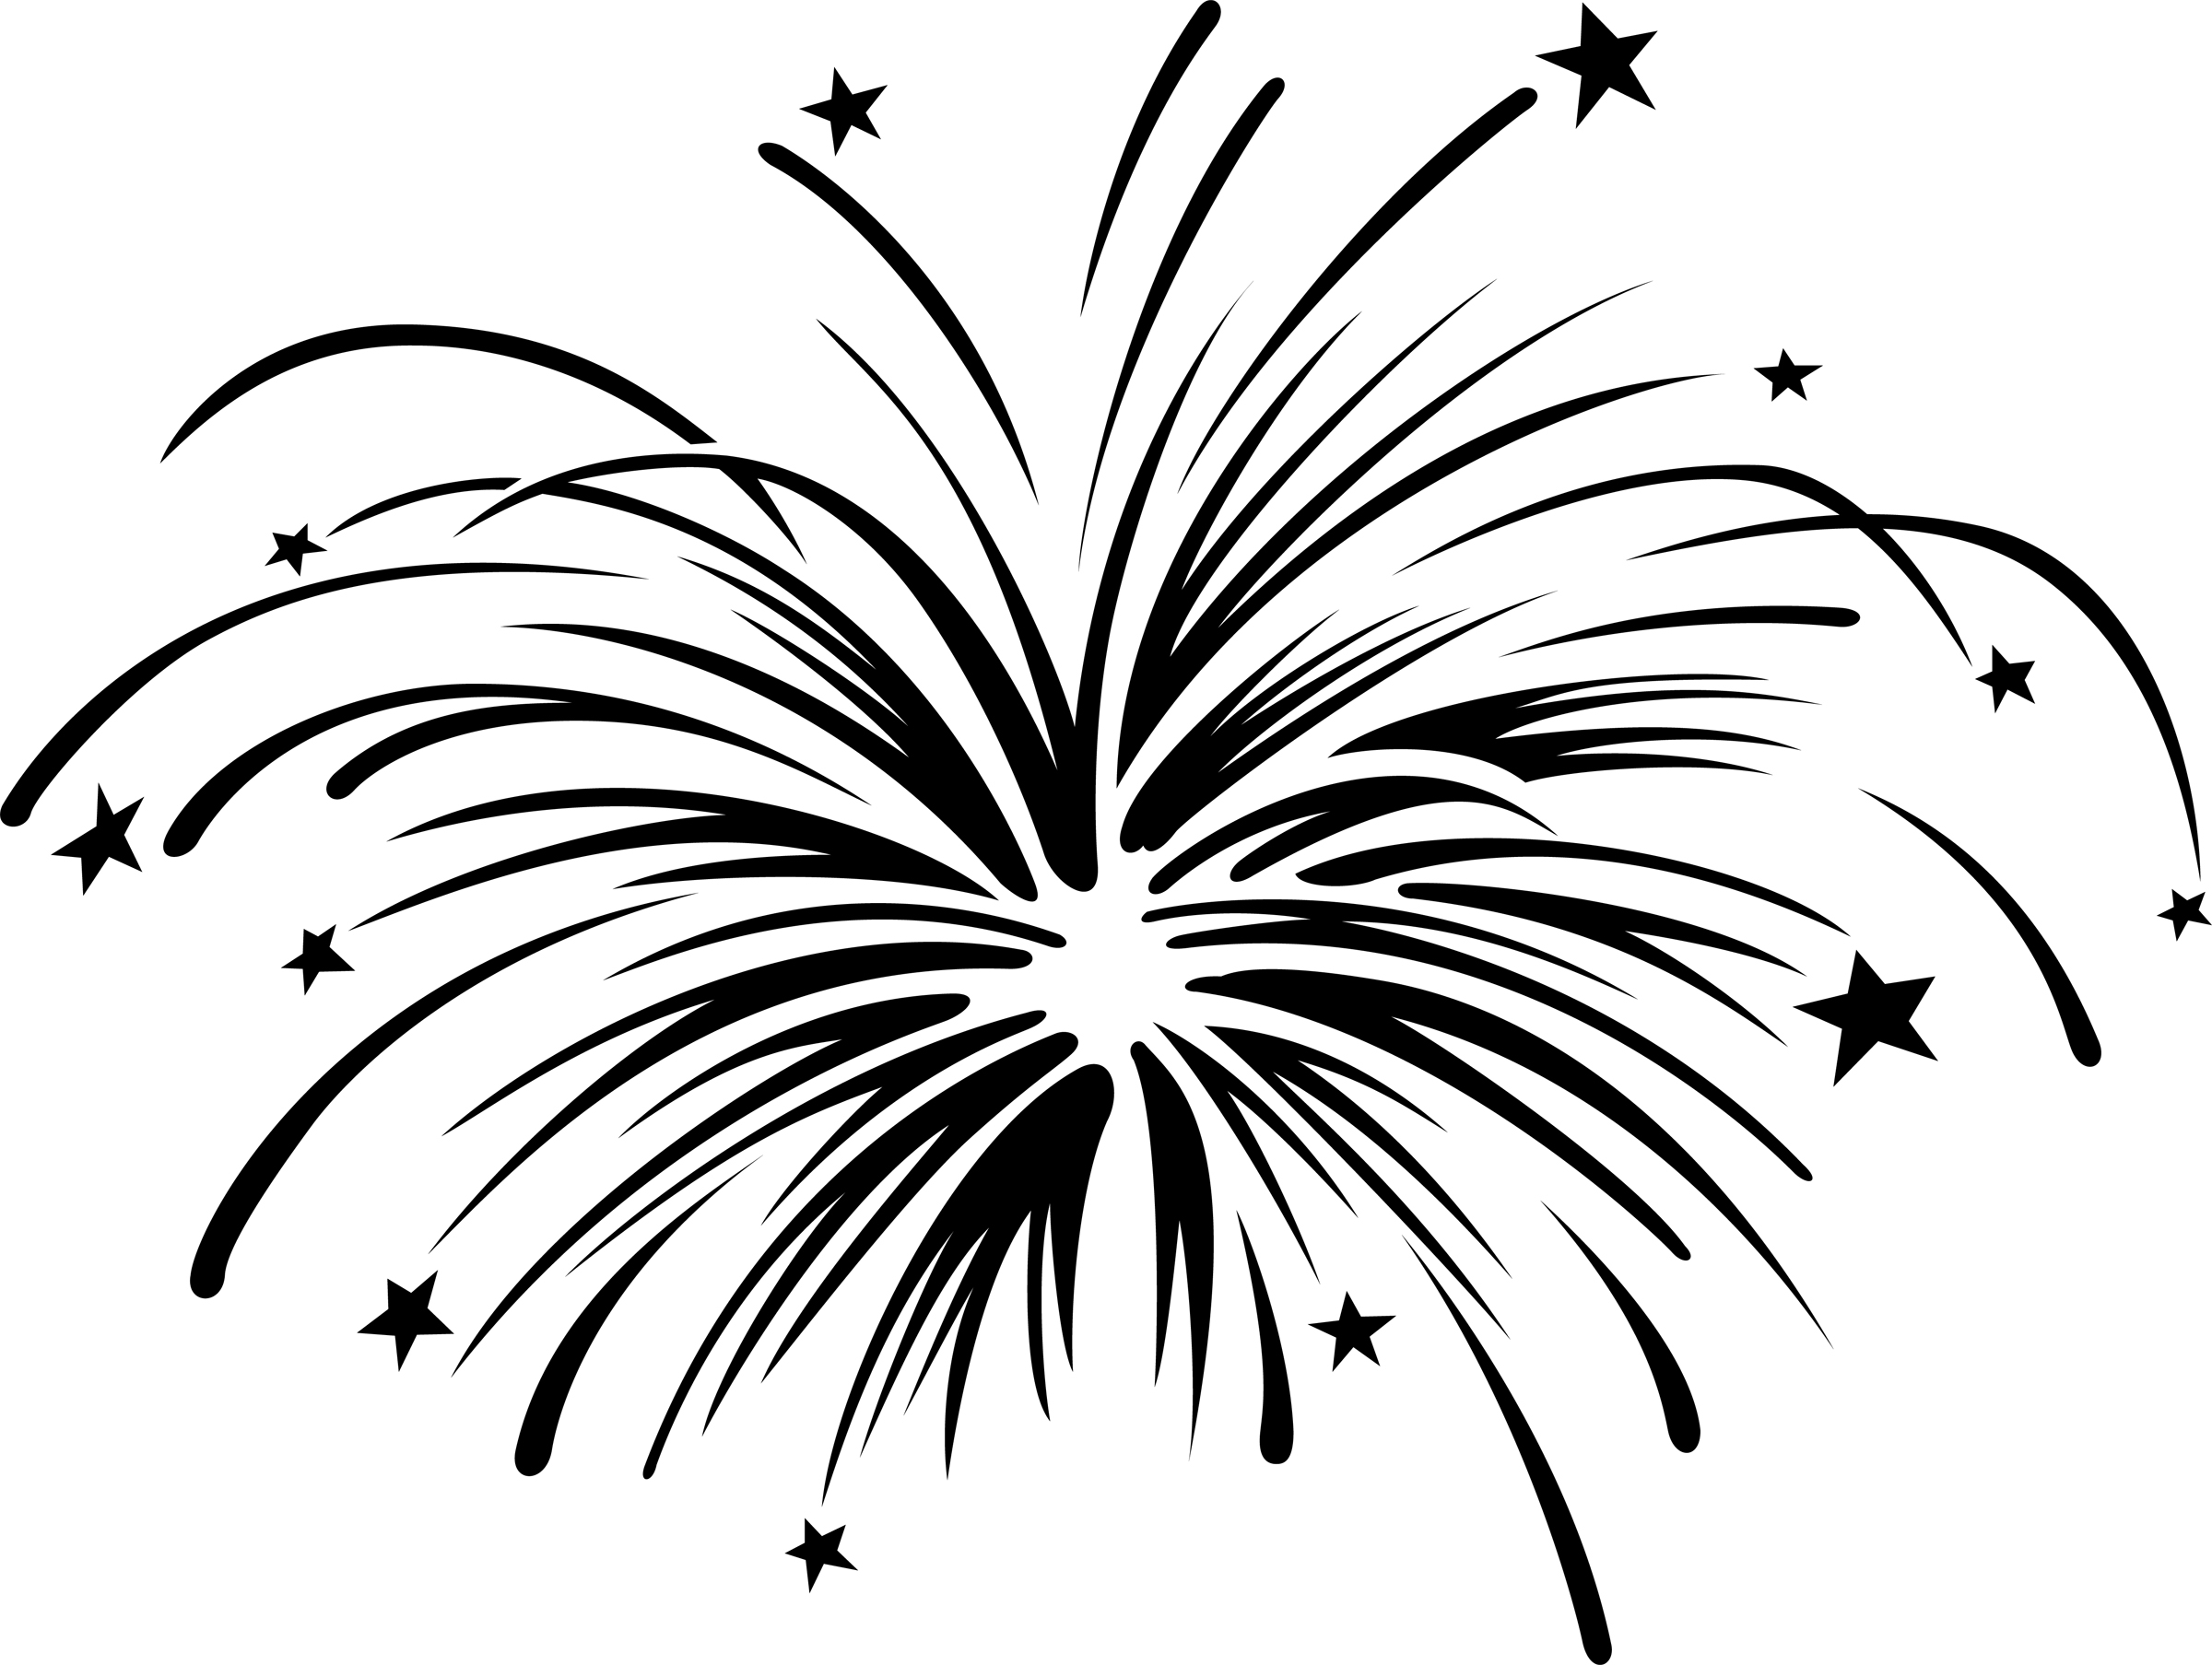 Silhouette Fireworks At Getdrawings